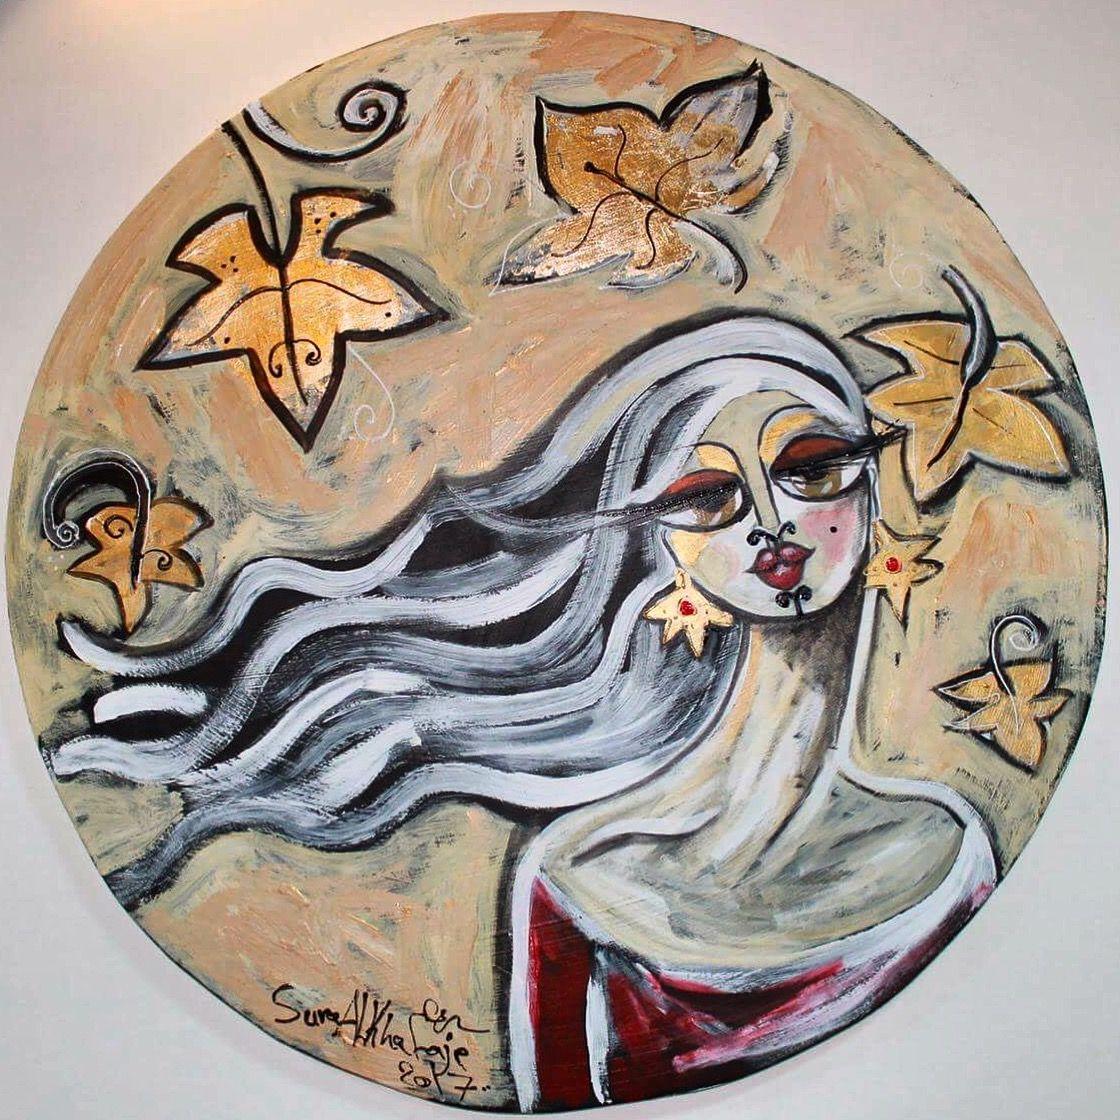 Pin By Sura Alkhafaje On Art Refugees Art Art Art Projects